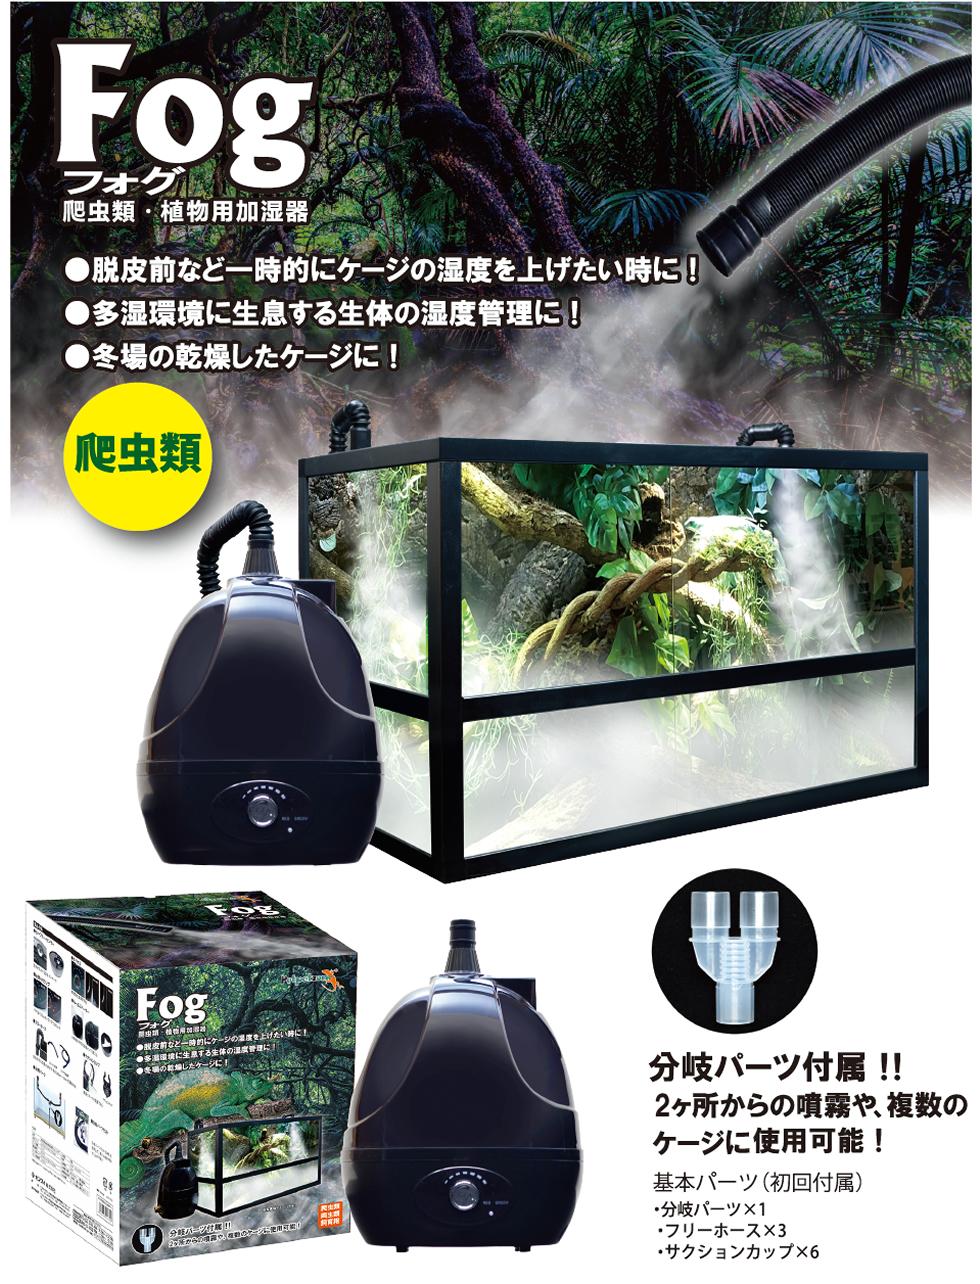 Fog / フォグ 爬虫類・植物用加湿器